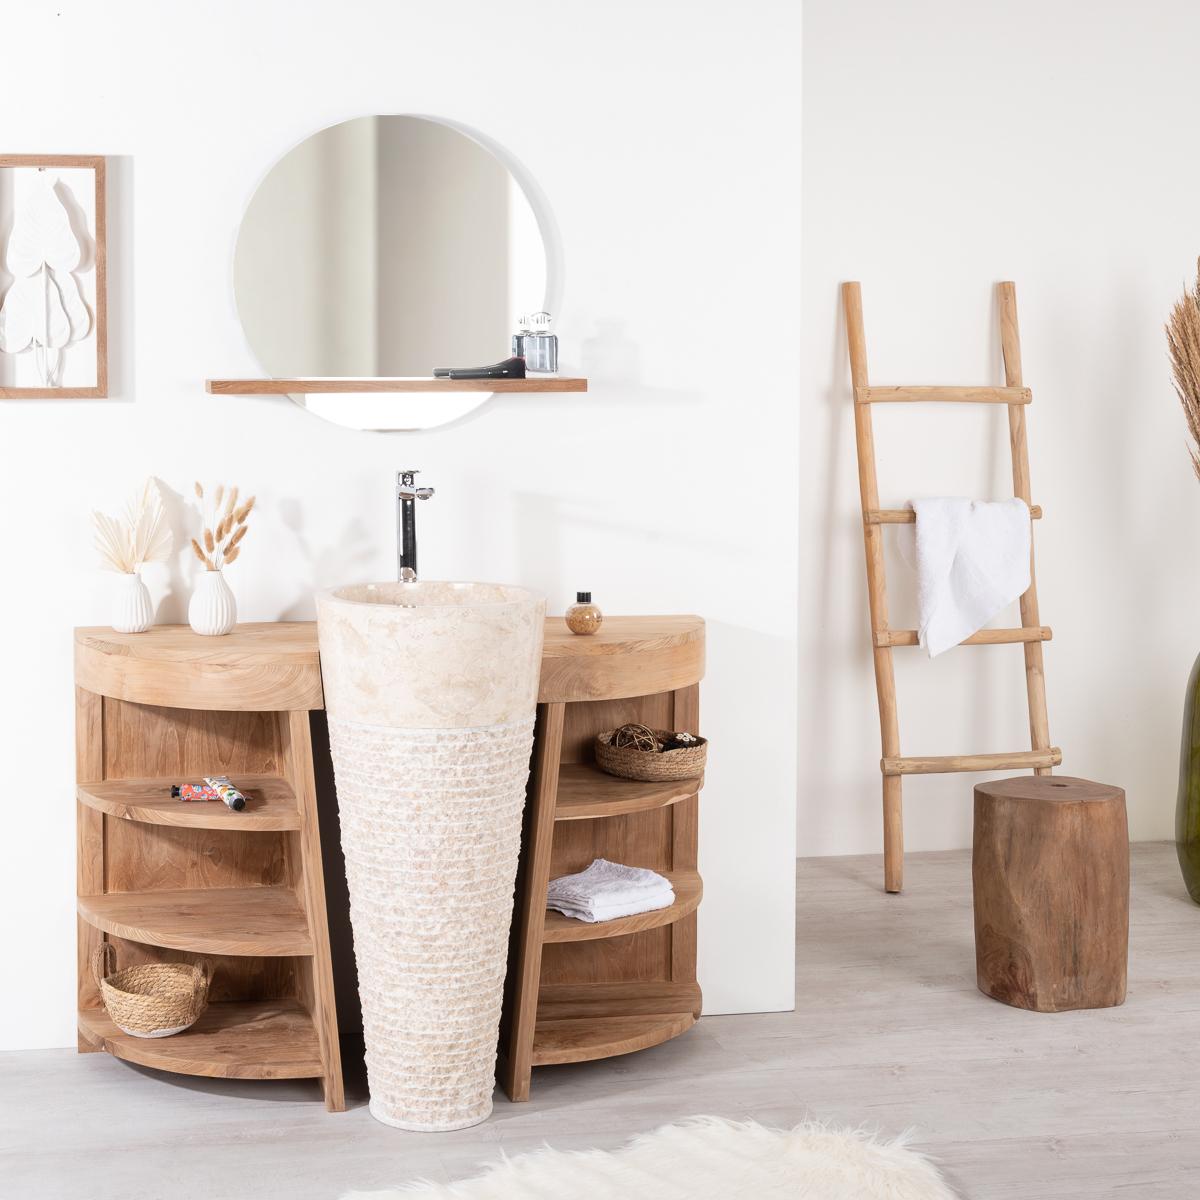 Miroir Bologne de salle de bain rond en teck massif